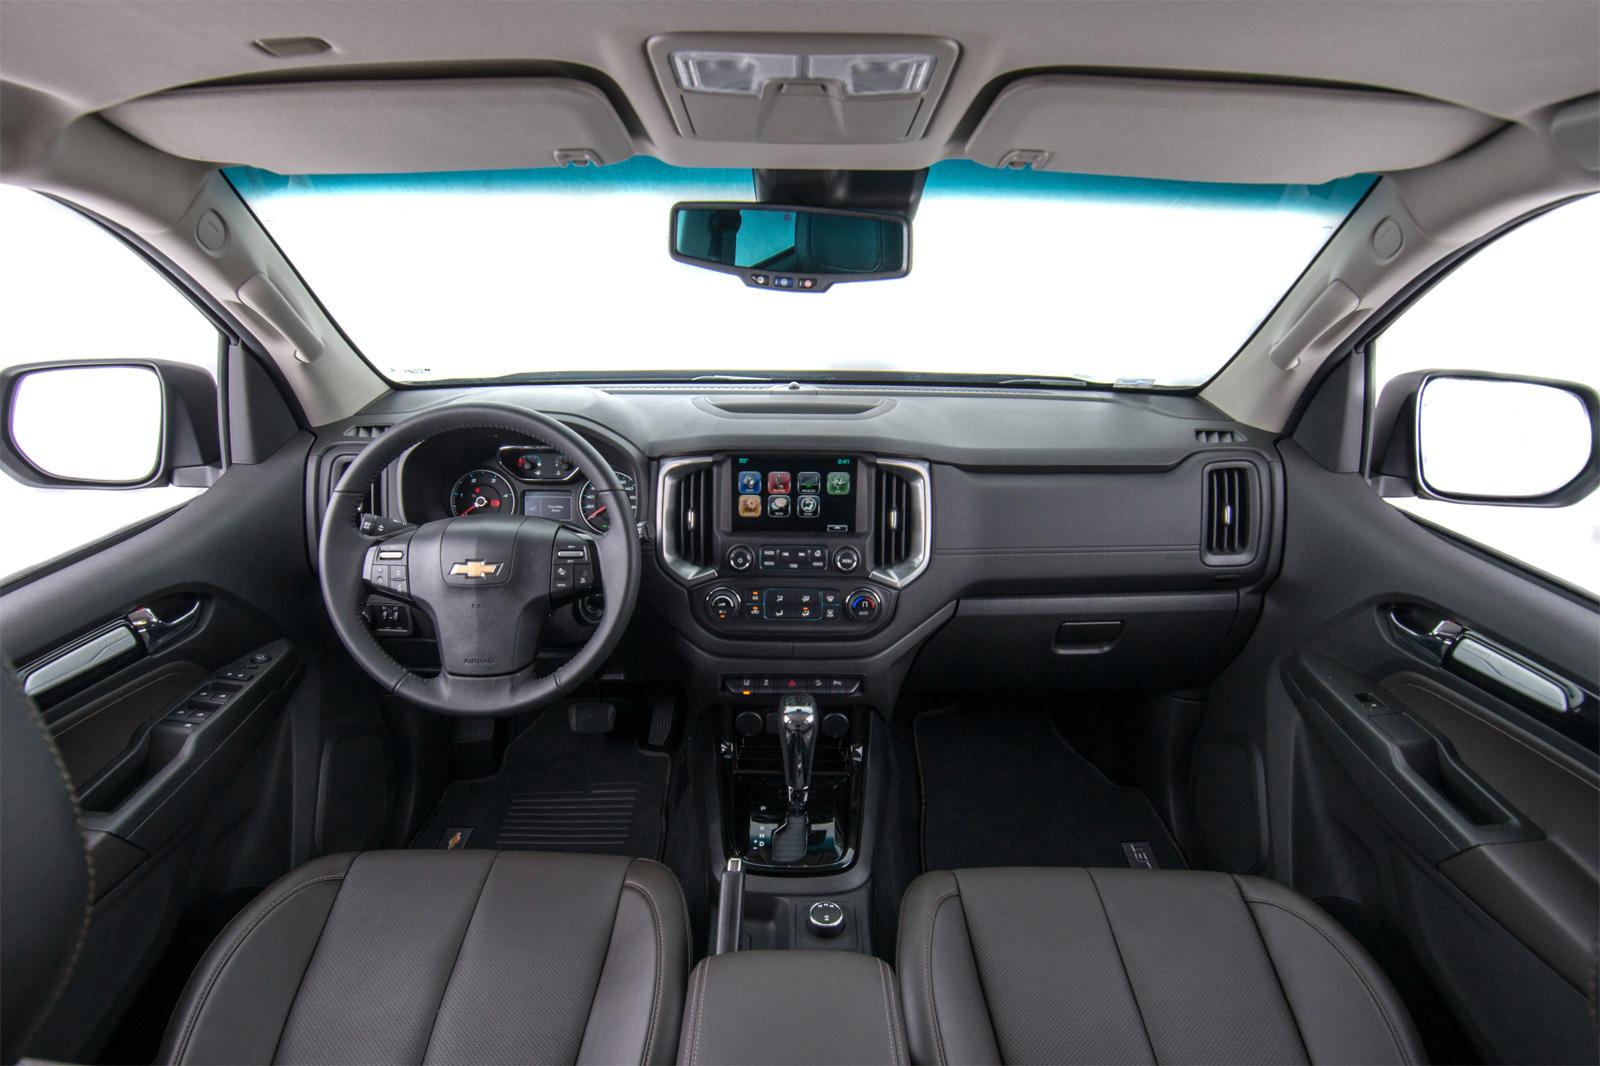 Chevrolet Trailblazer (2019-2020) цена и характеристики ...